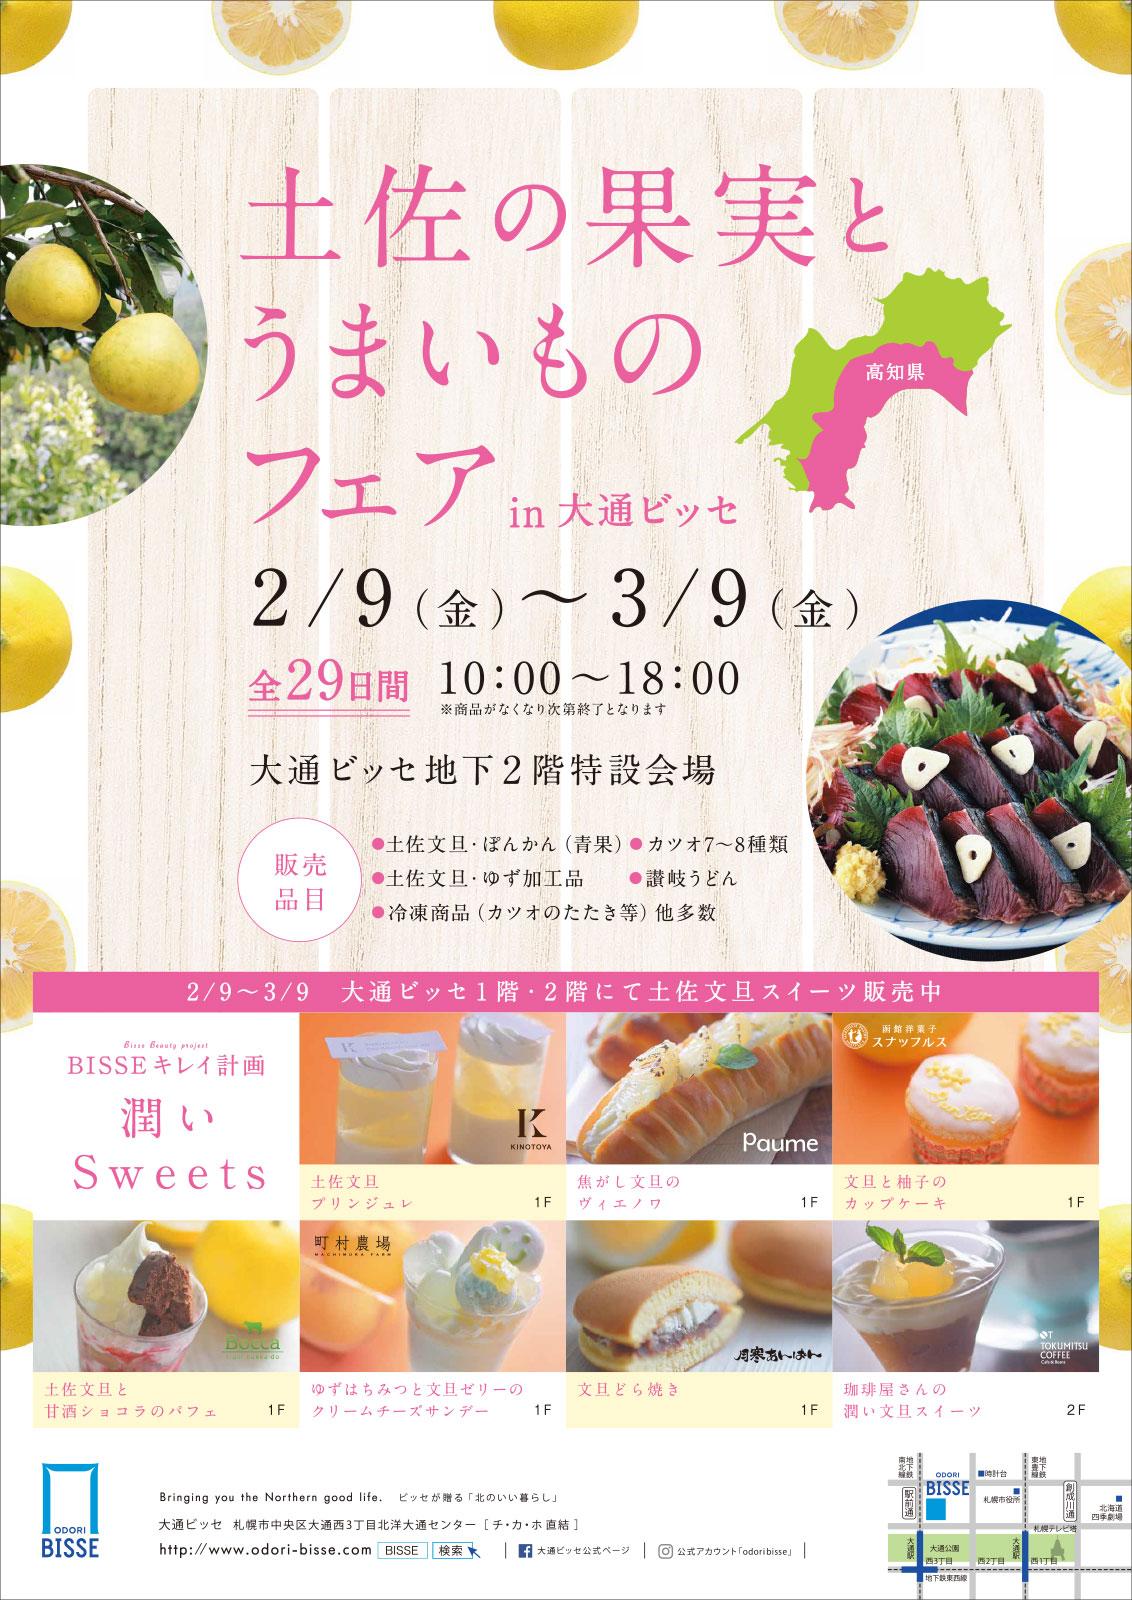 http://www.odori-bisse.com/info/up_images/news_180205_img04.jpg